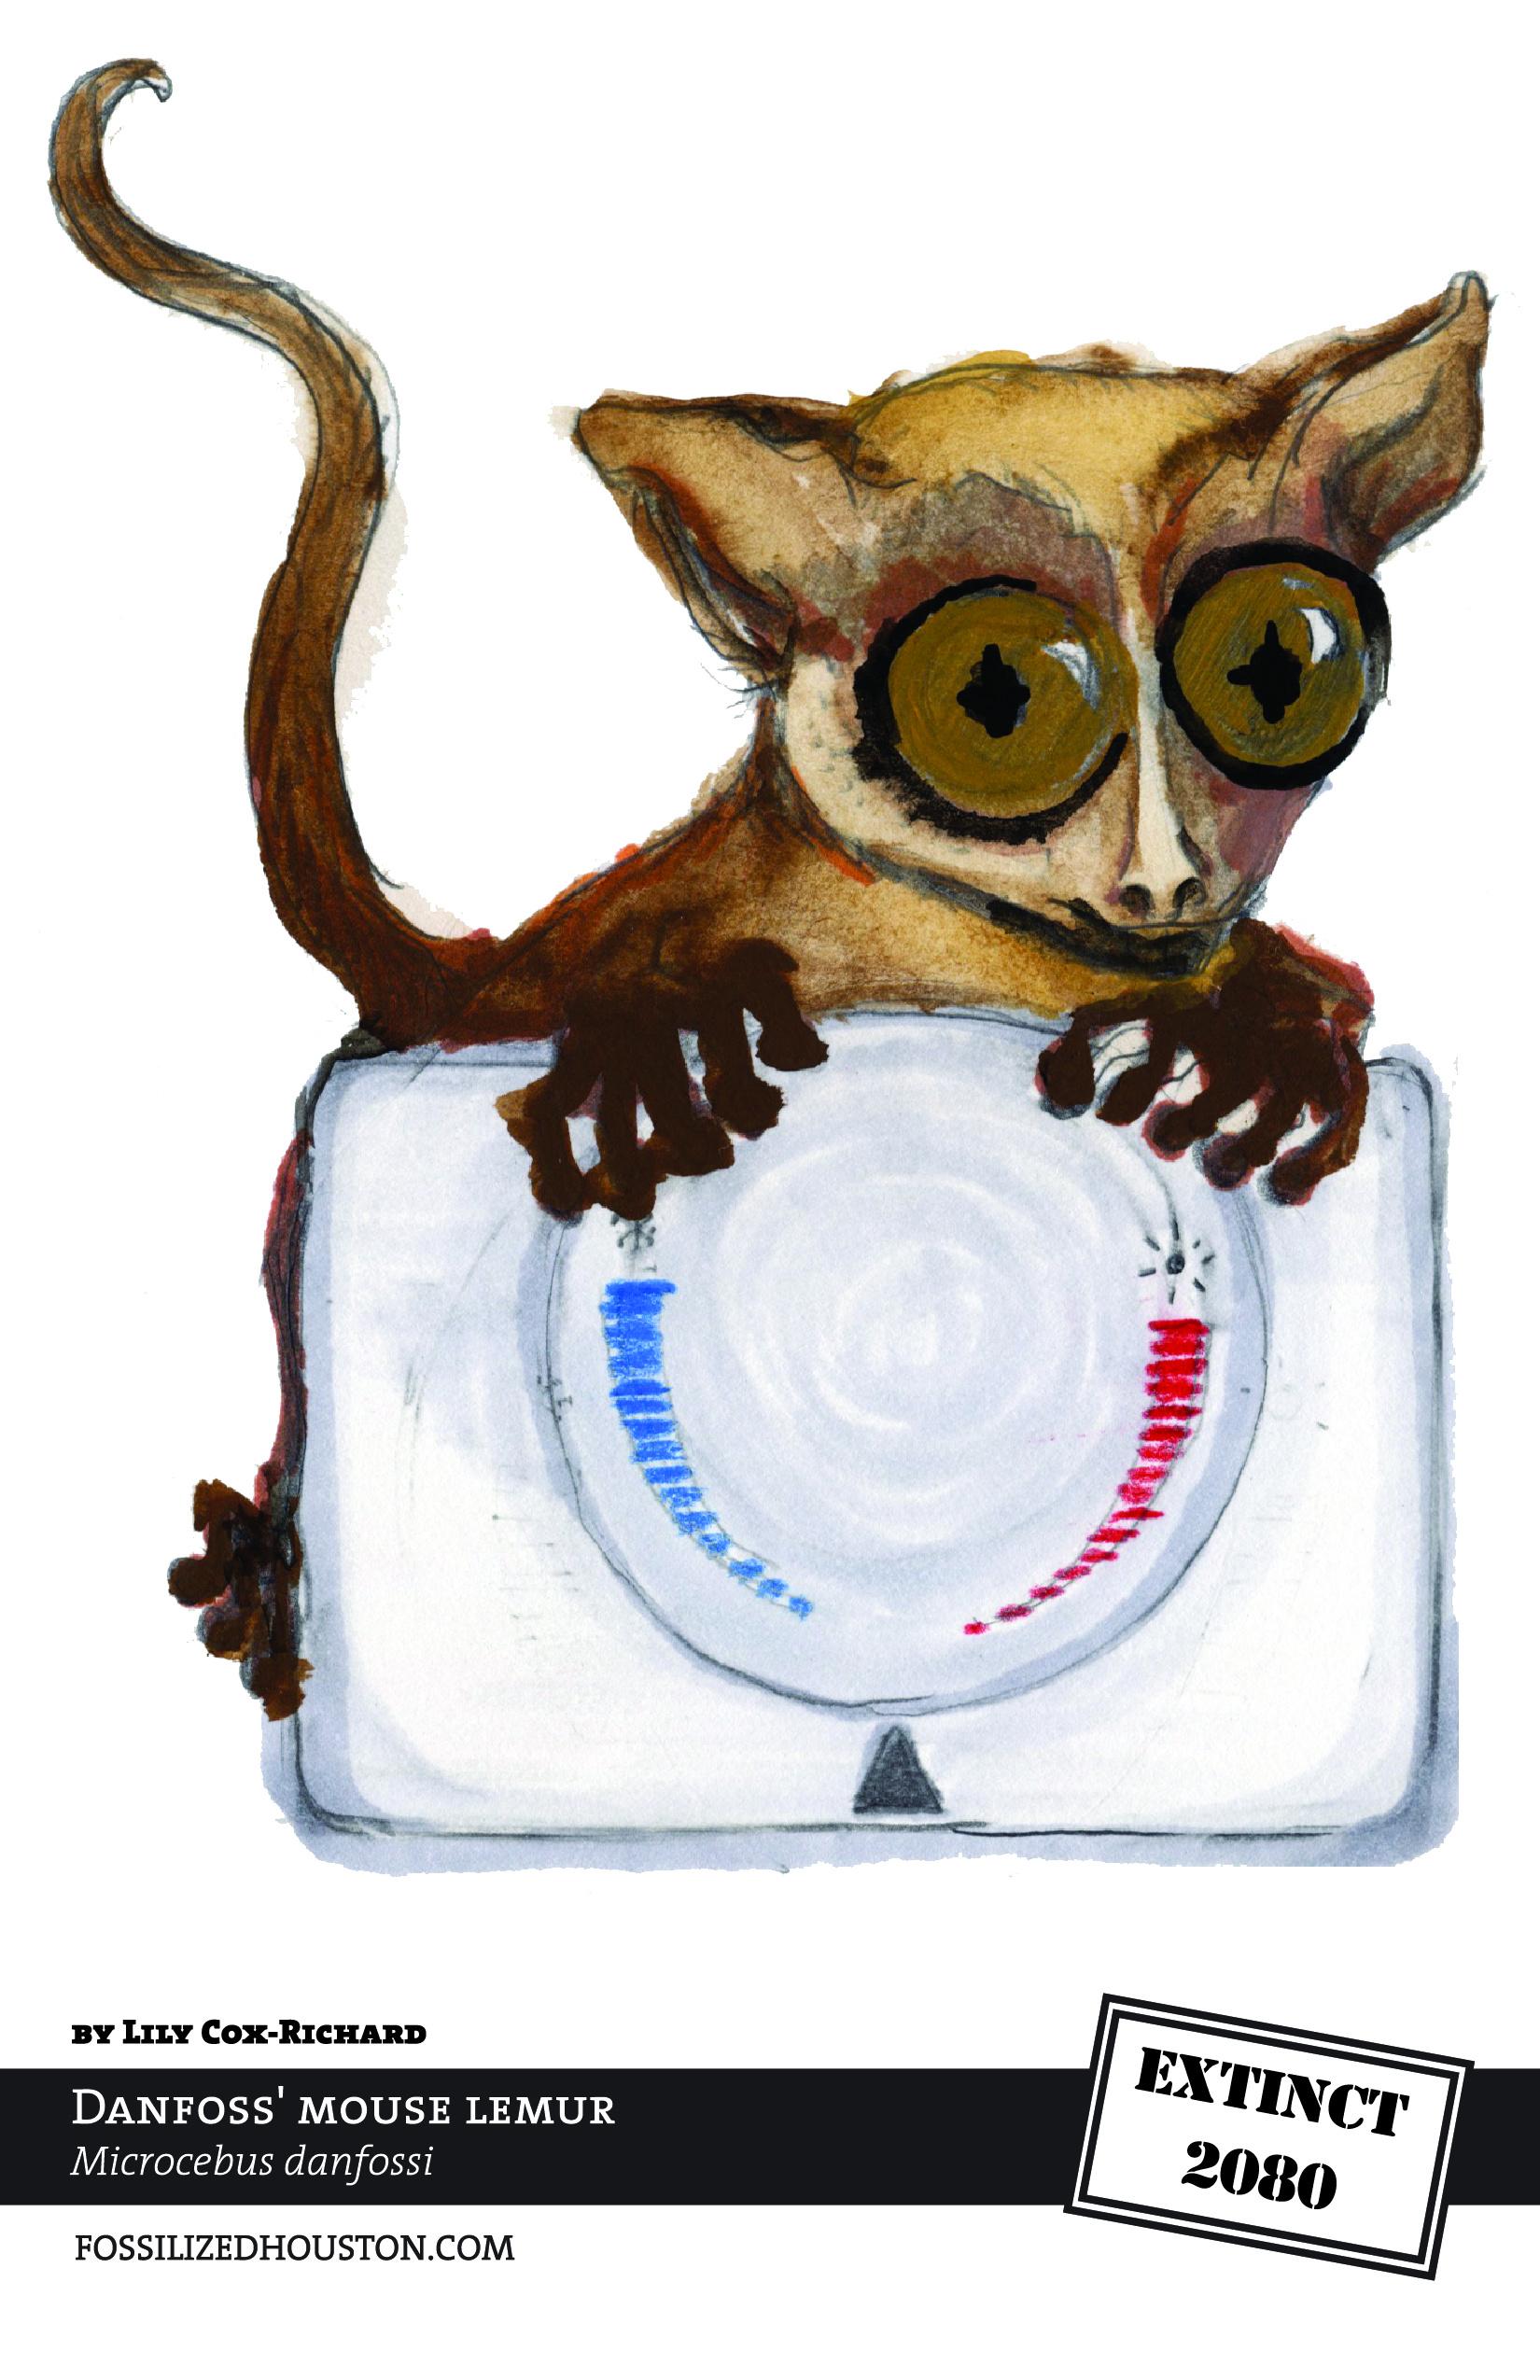 Danfoss' Mouse Lemur